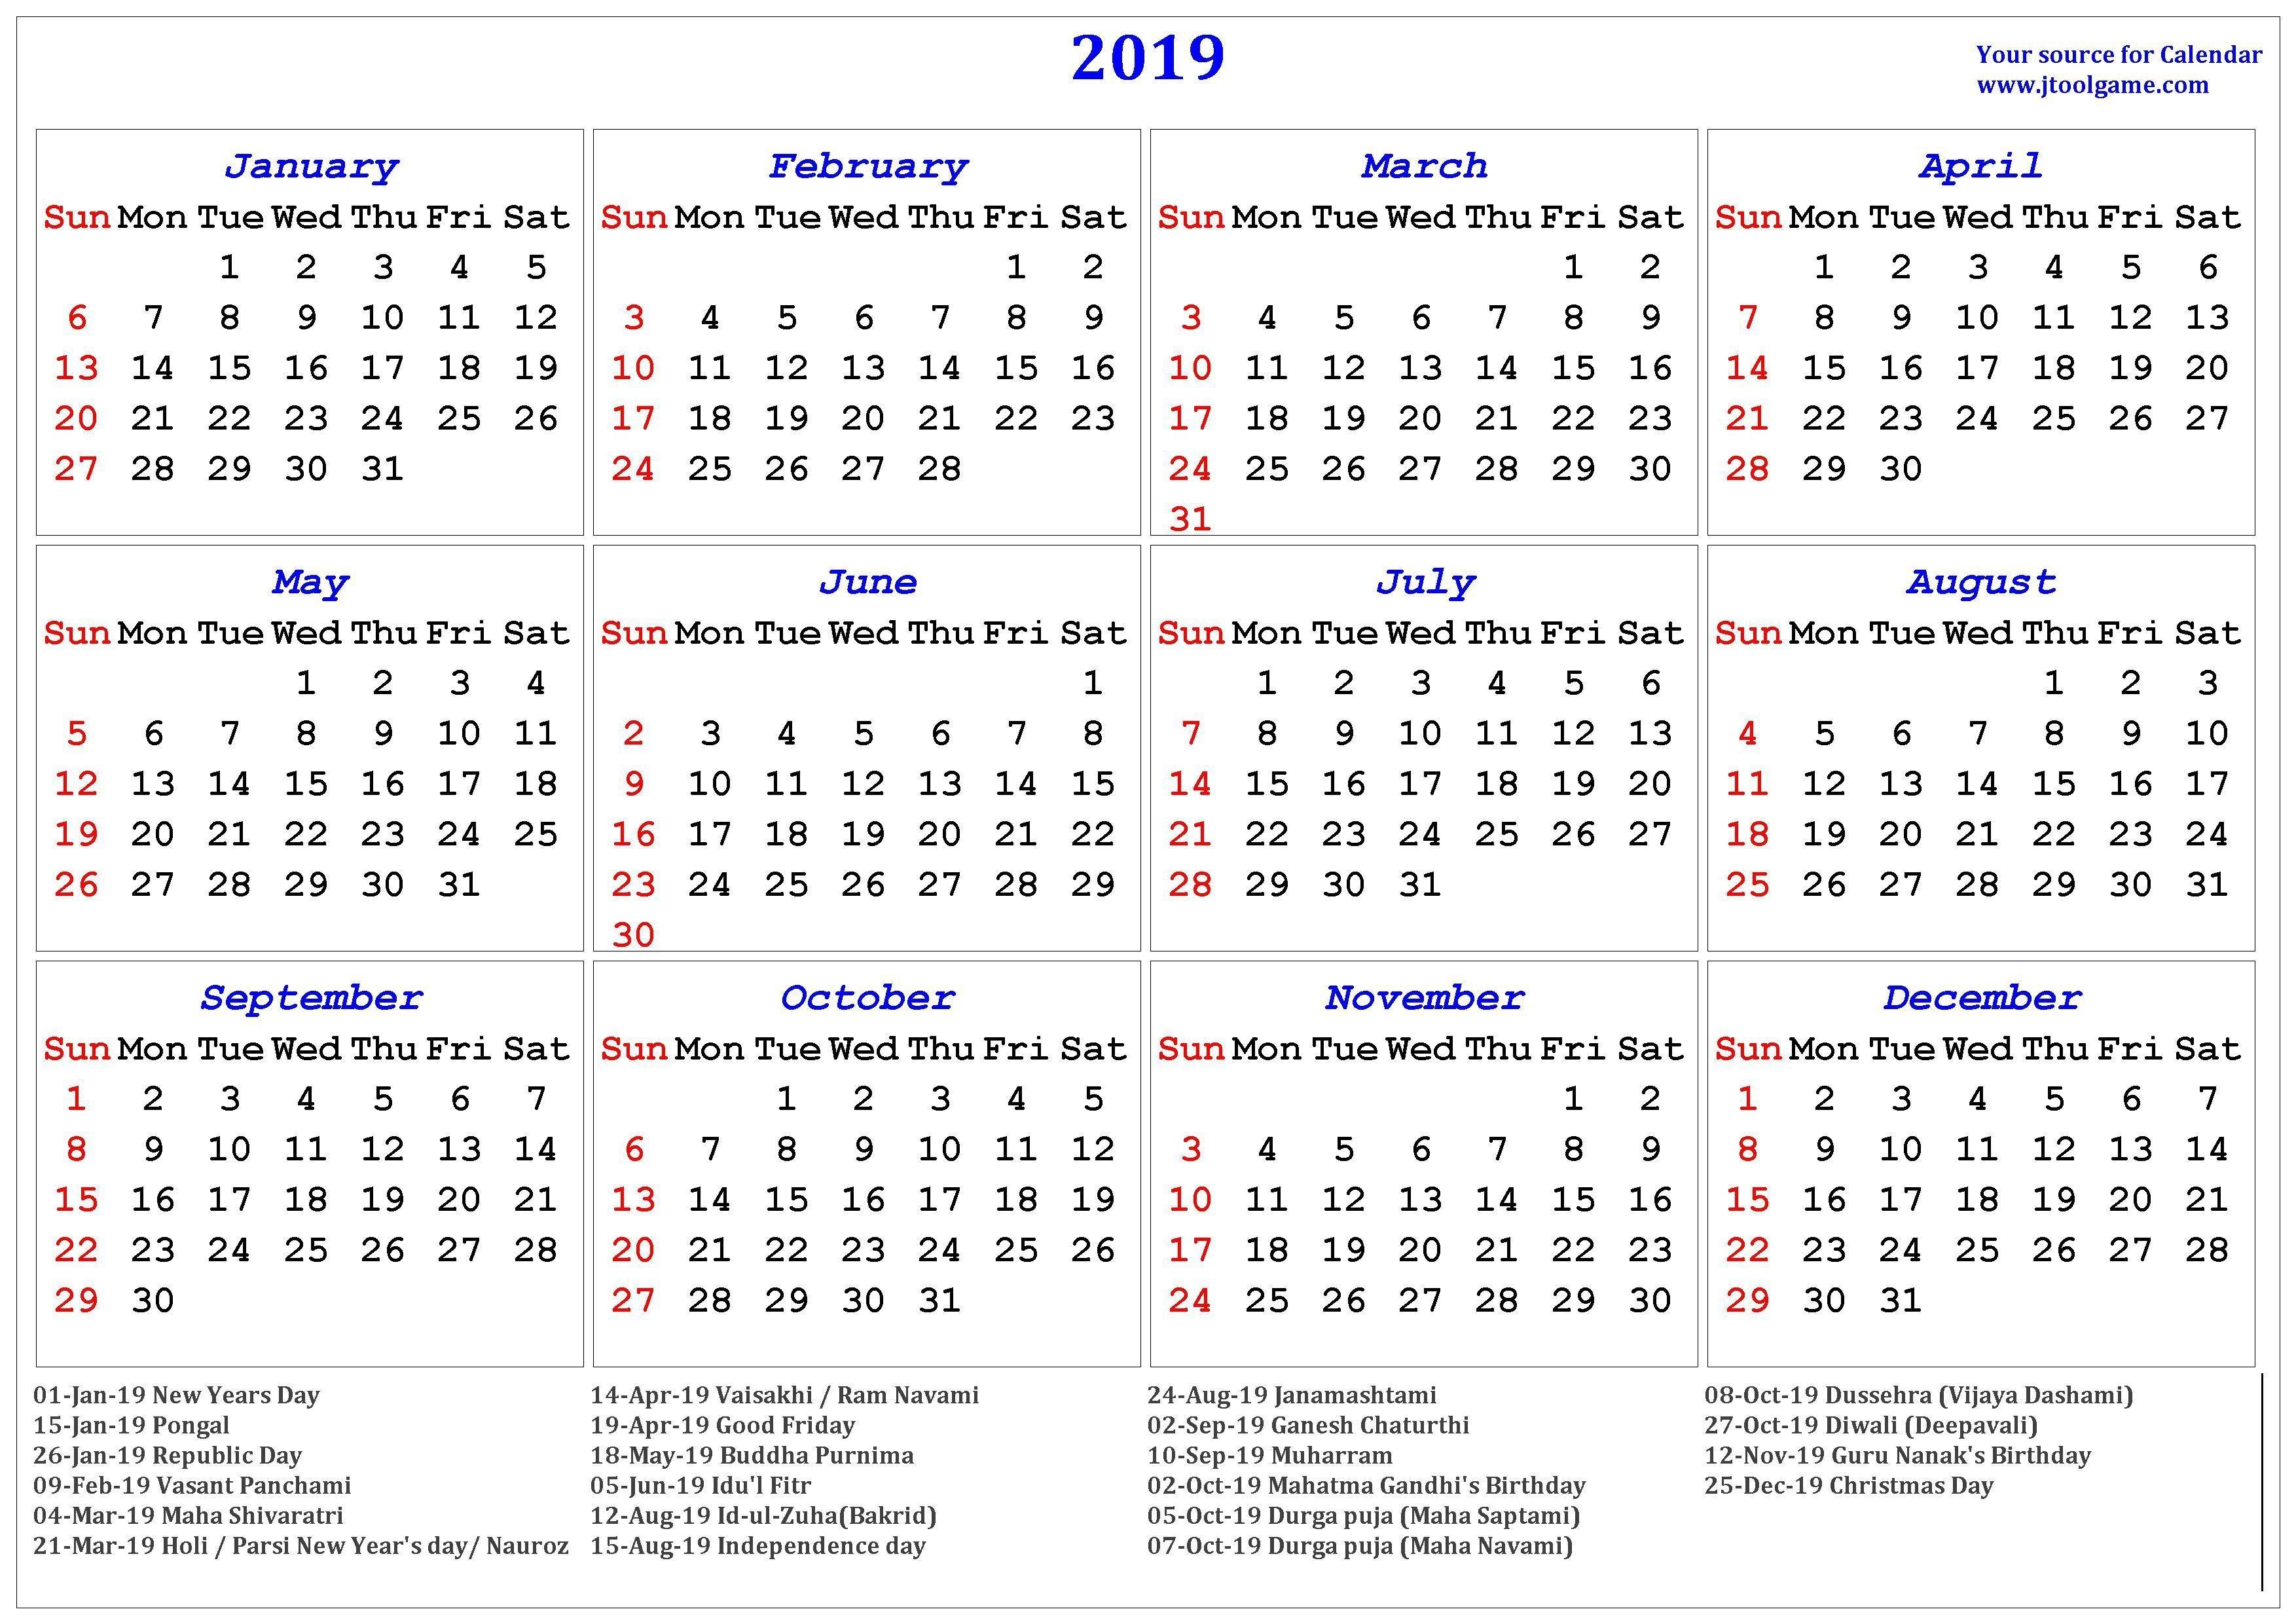 2019 Hindu Calendar With Tithi | Tyohar, Holidays, Festivals-2020 Calendar Template With Catholic Holidays